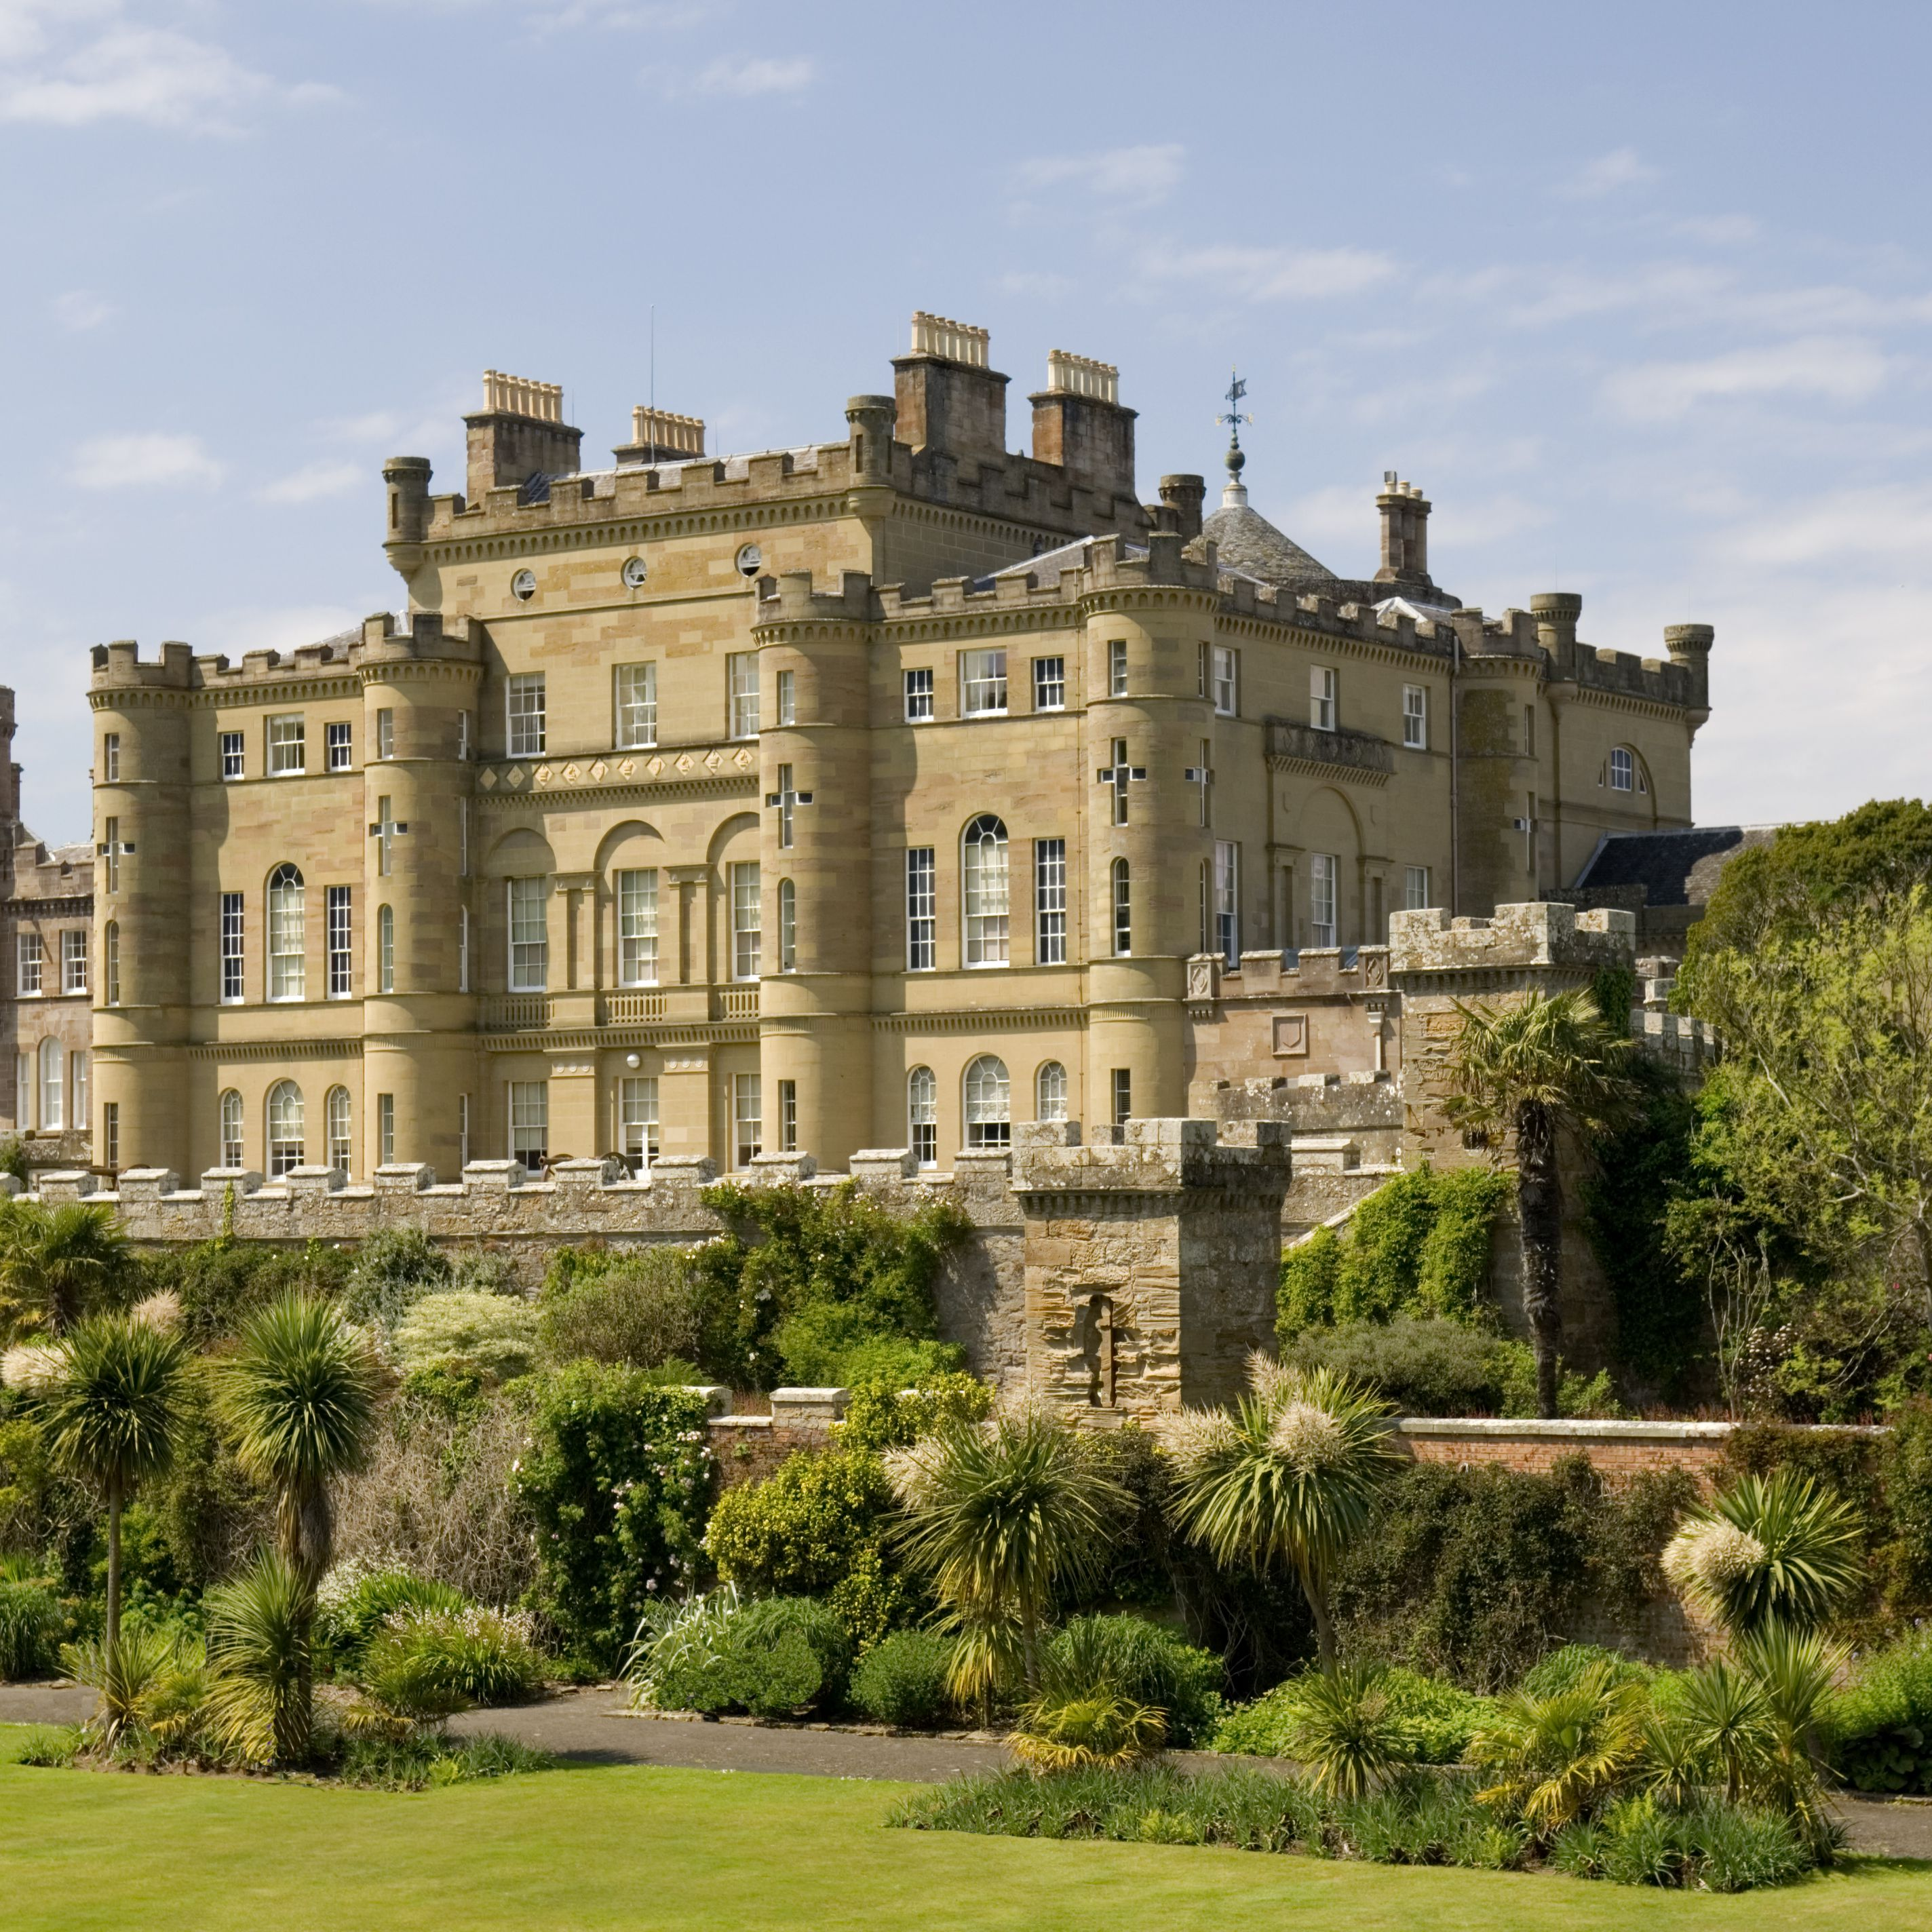 Culzean Castle: The Complete Guide